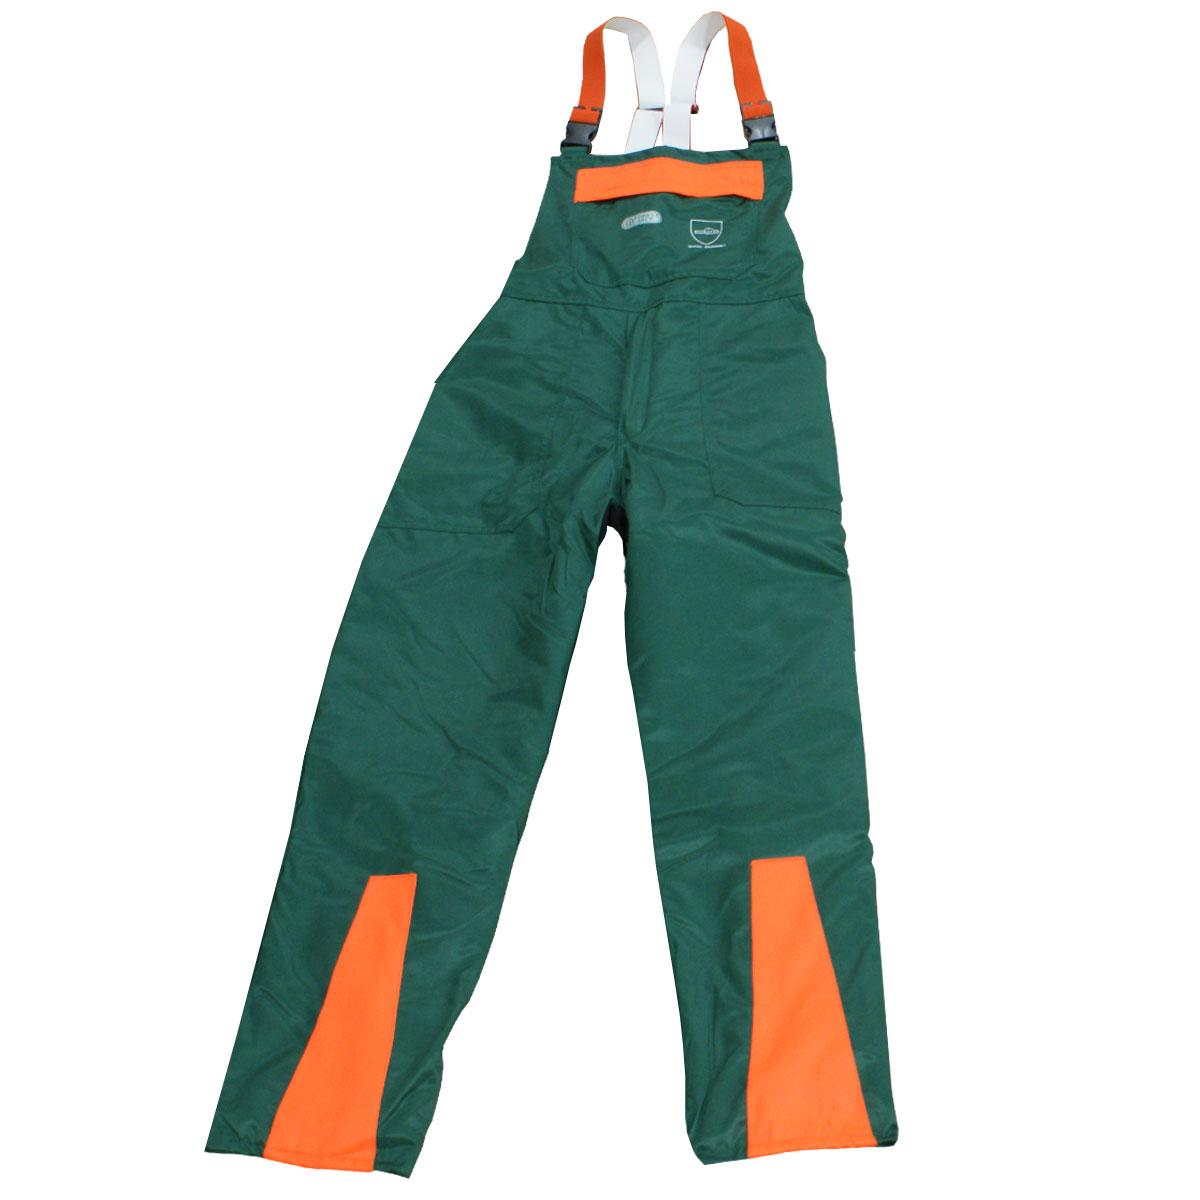 Bild zu KWF FPA Forst Schnittschutz-Latzhose EN 381 Class1 grün-orange